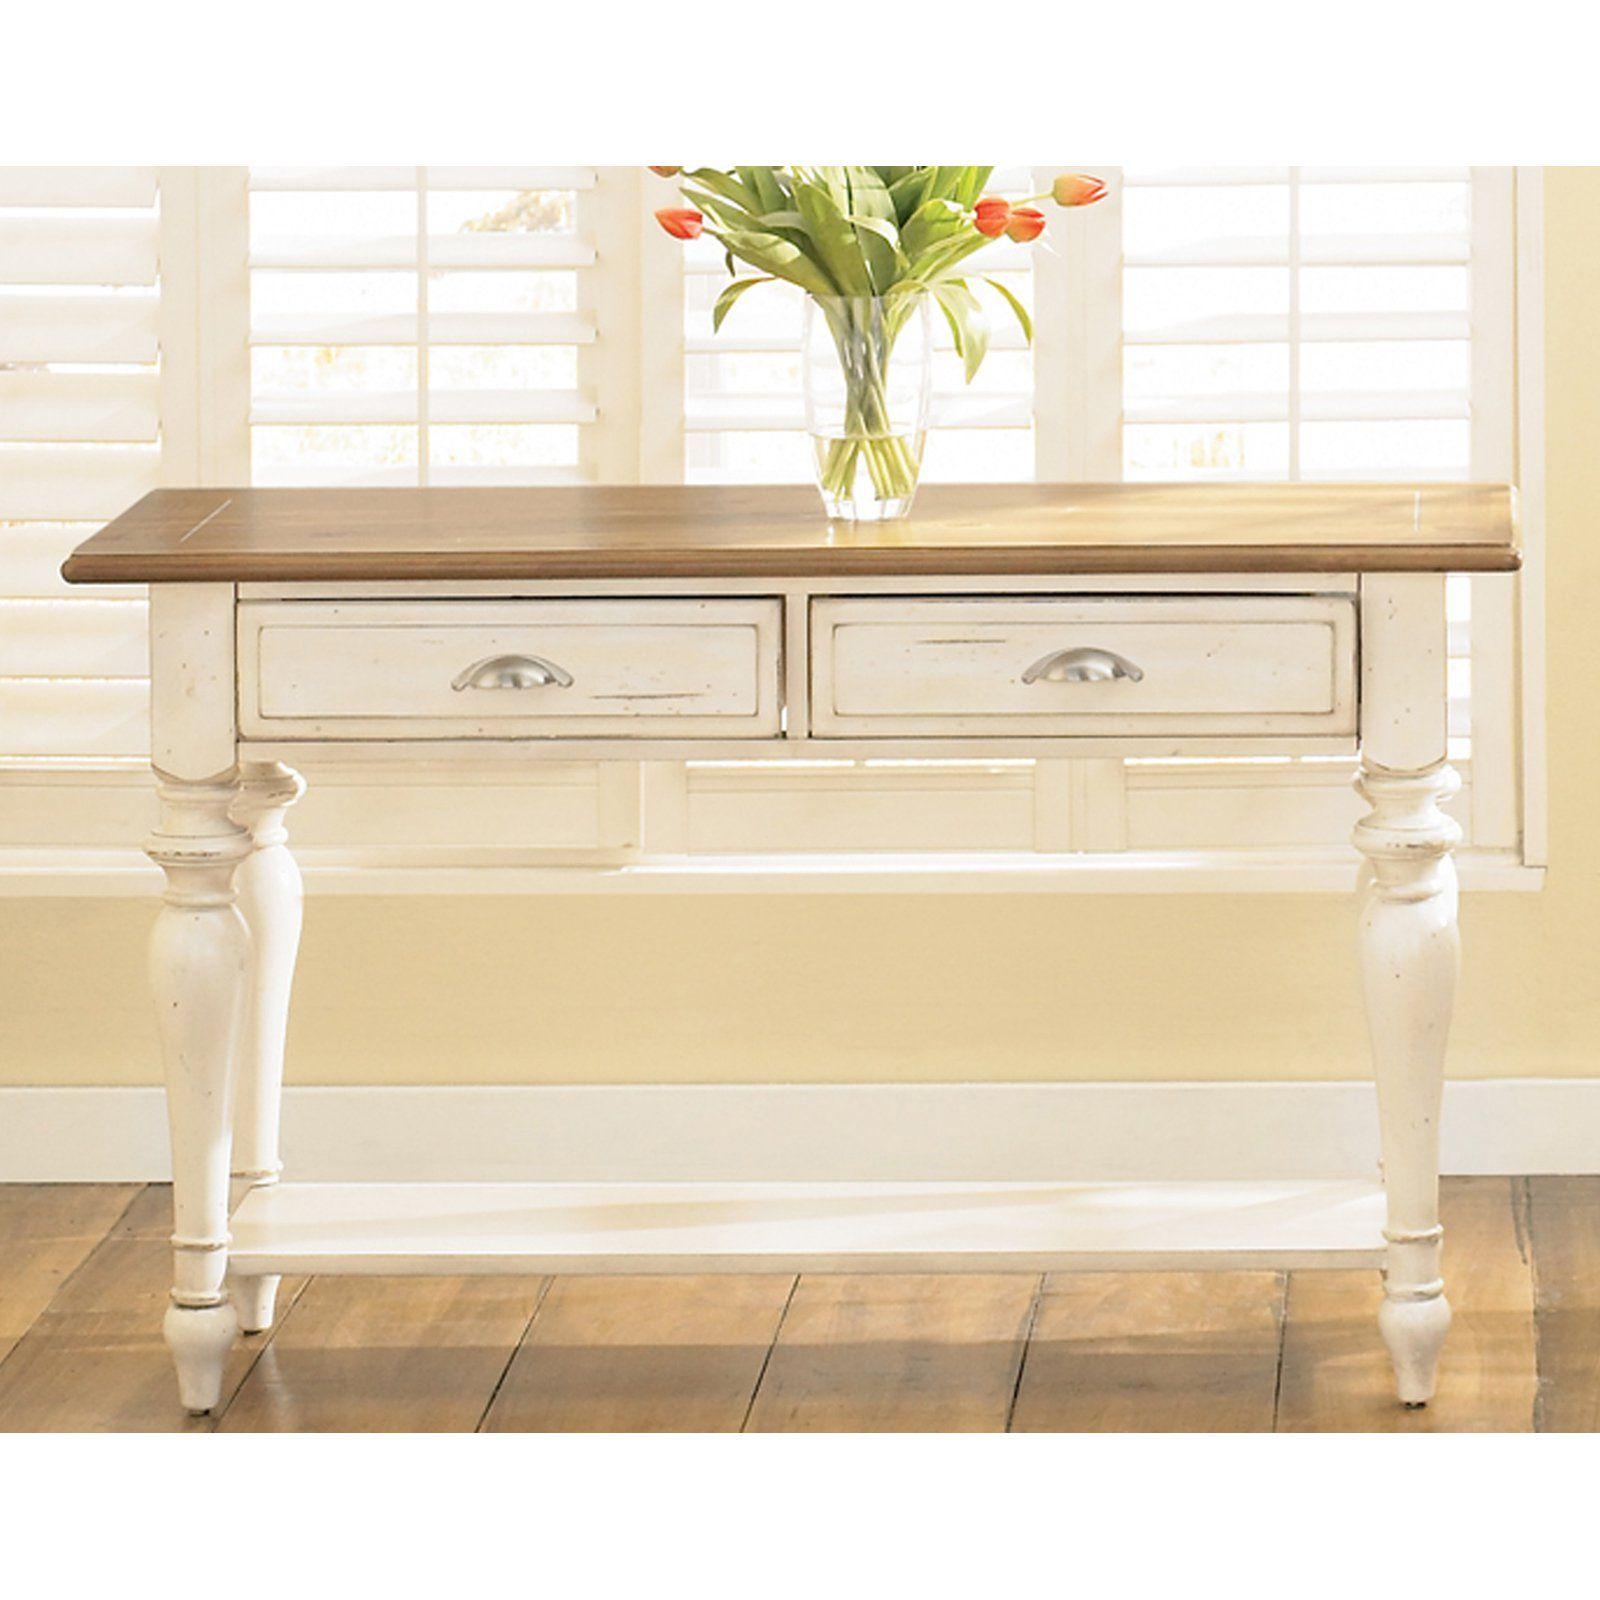 Liberty Furniture Ocean Isle Sofa Table Thereus something so fresh